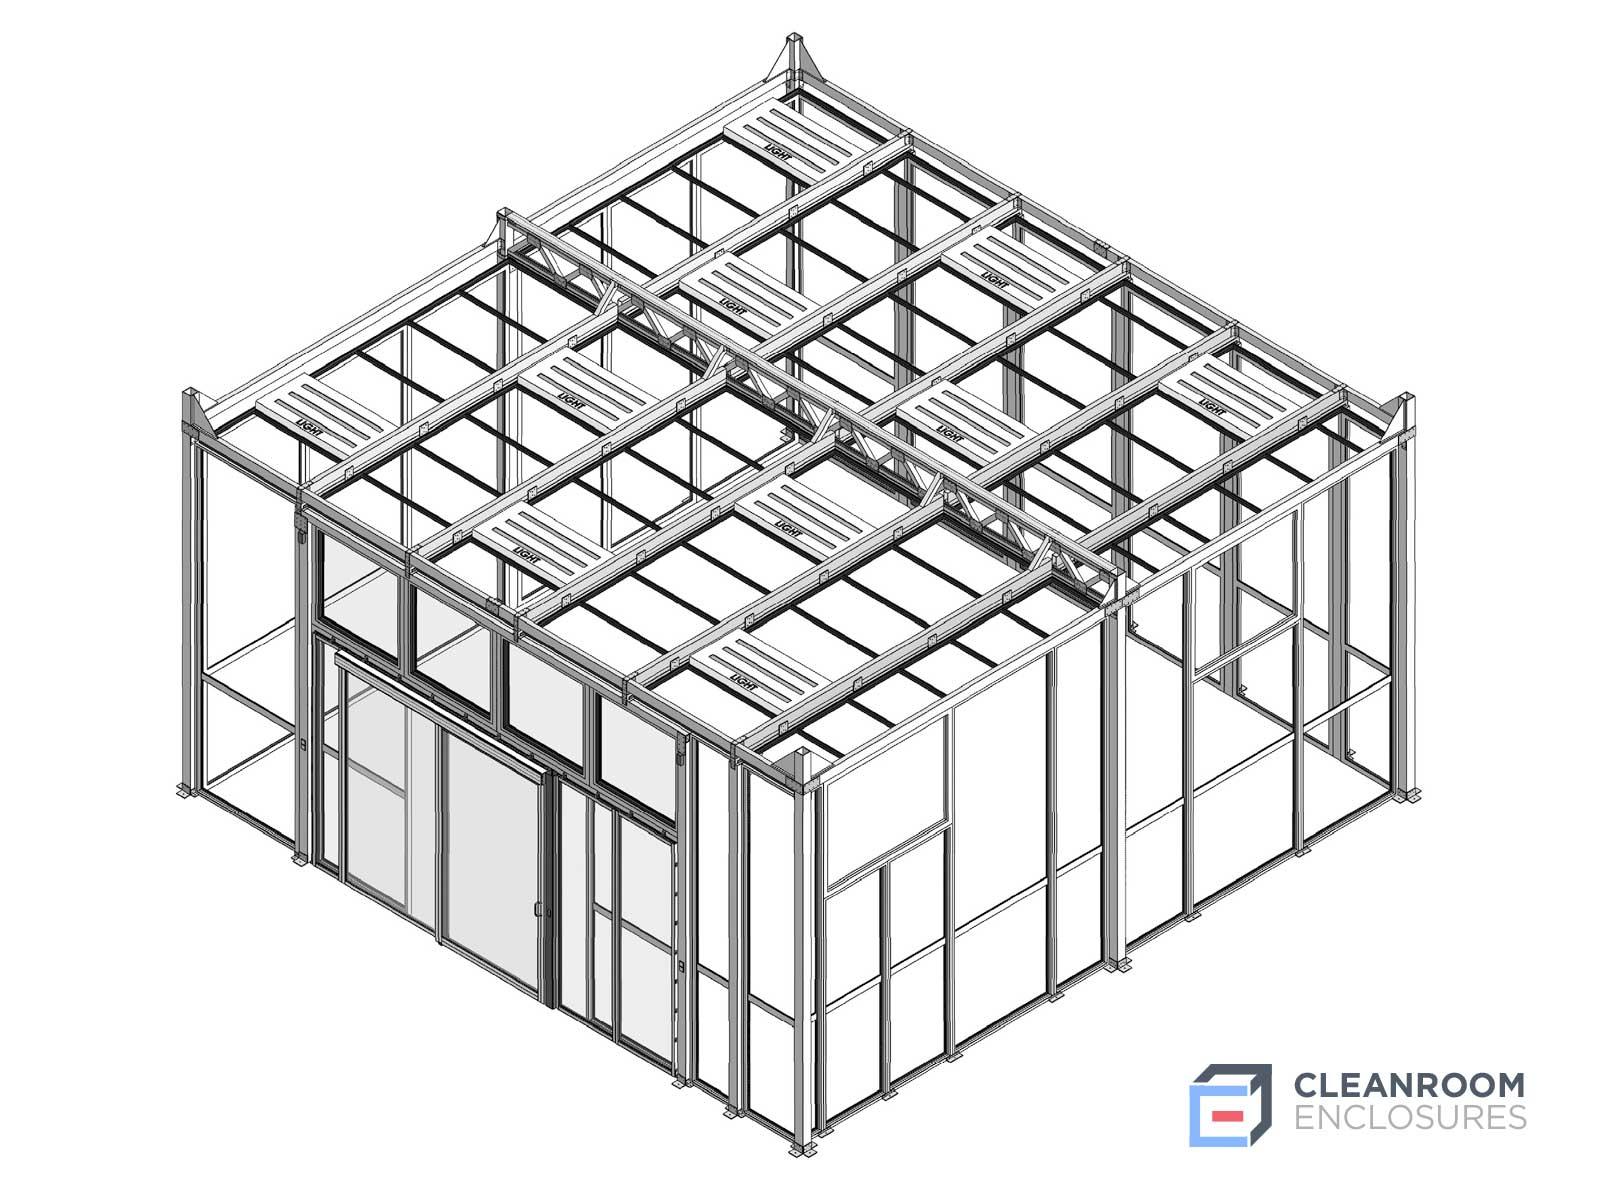 Diagram of a modular cleanroom